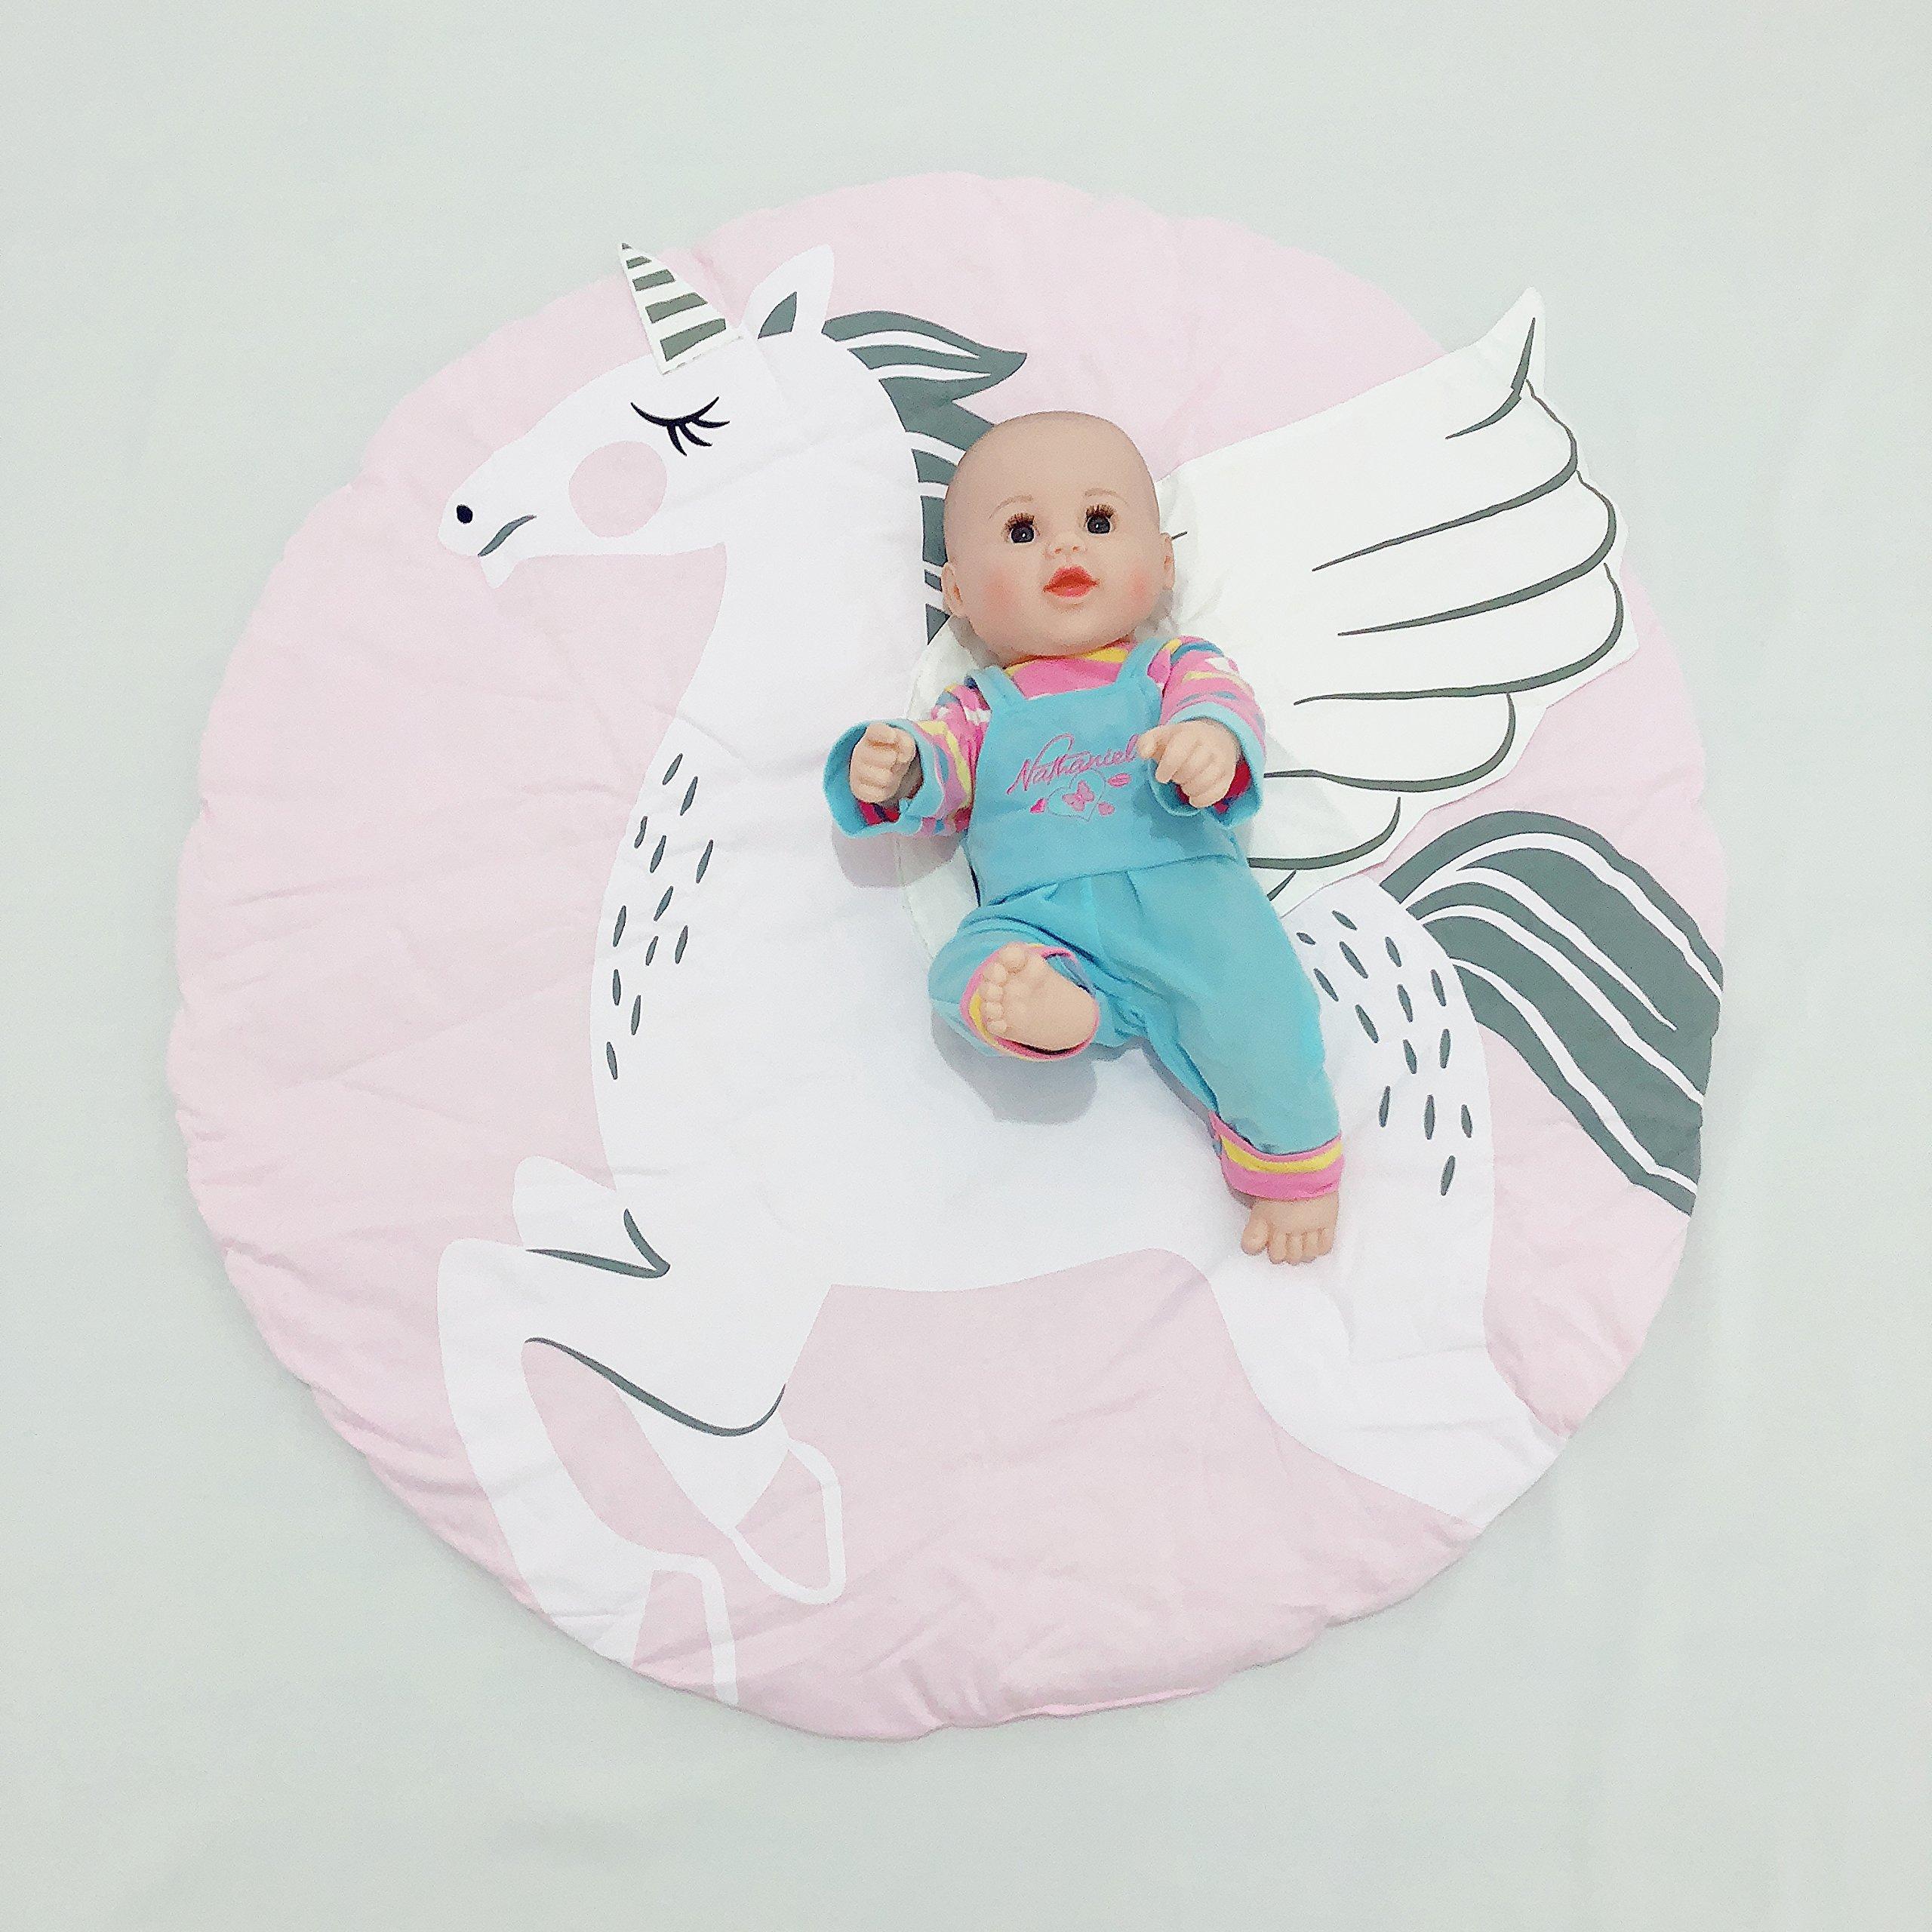 (Diameter:38 inches) Circle,Round Cute Baby Play Mat, Adventure Carpet,Crawling Mat, Children's Room Decoration (Unicorn)